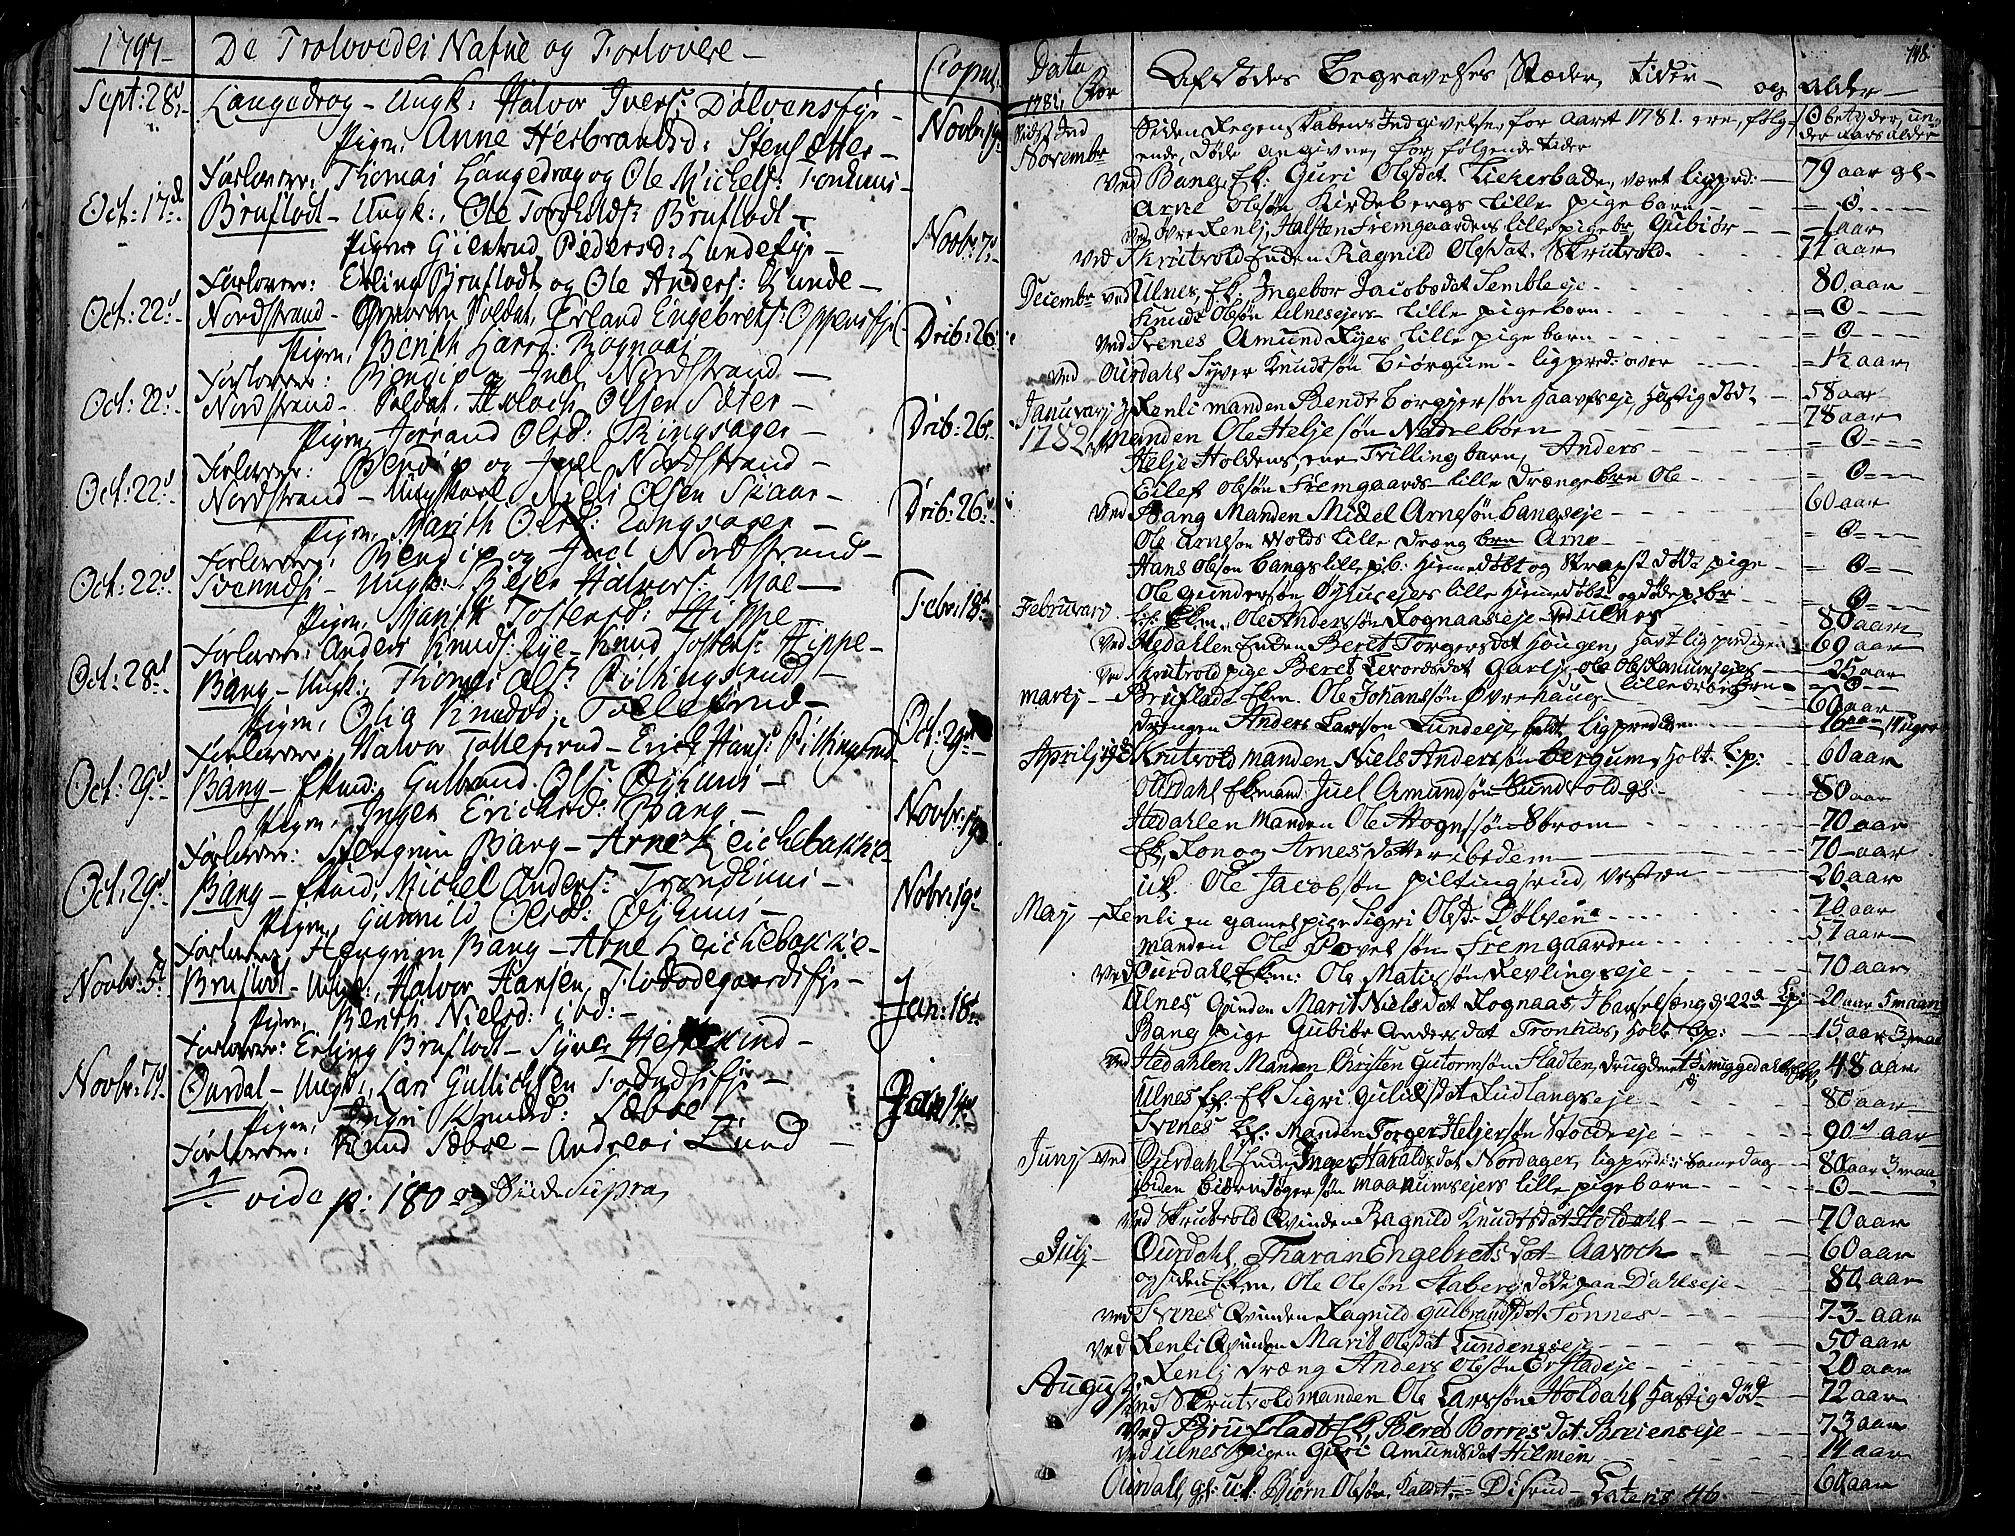 SAH, Aurdal prestekontor, Ministerialbok nr. 6, 1781-1804, s. 148